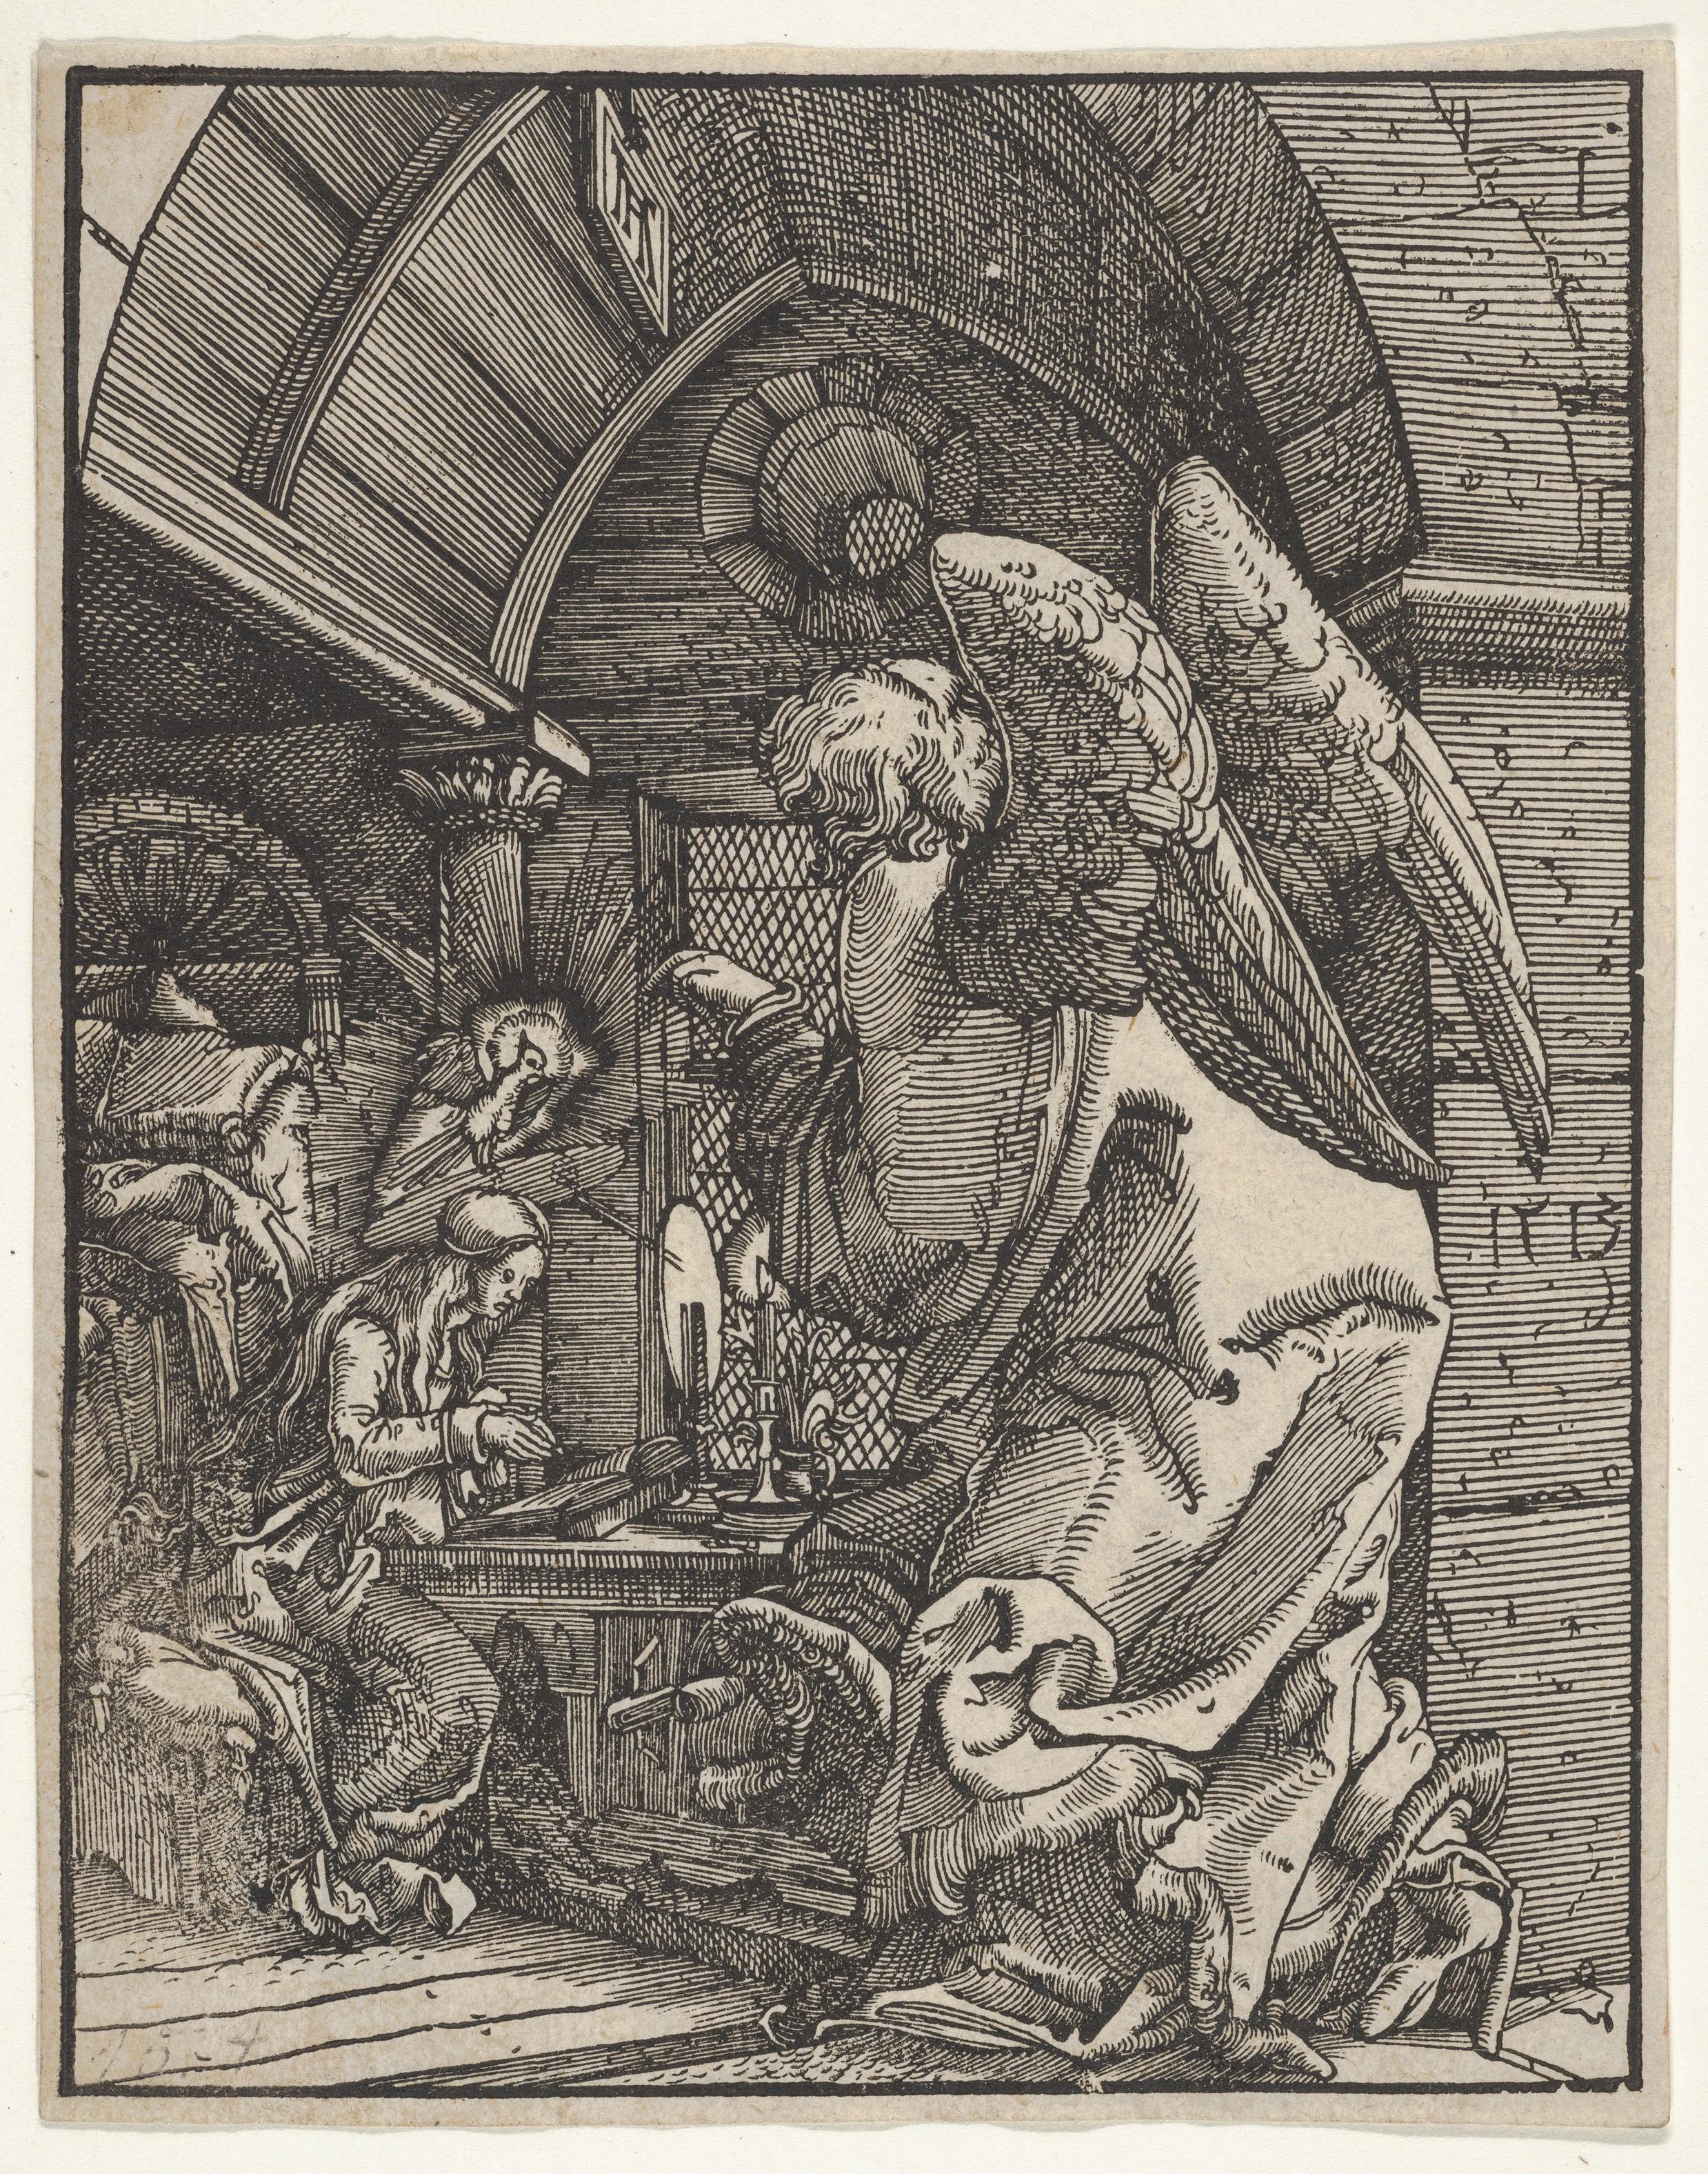 1513-altdorfer-anunciation.jpg